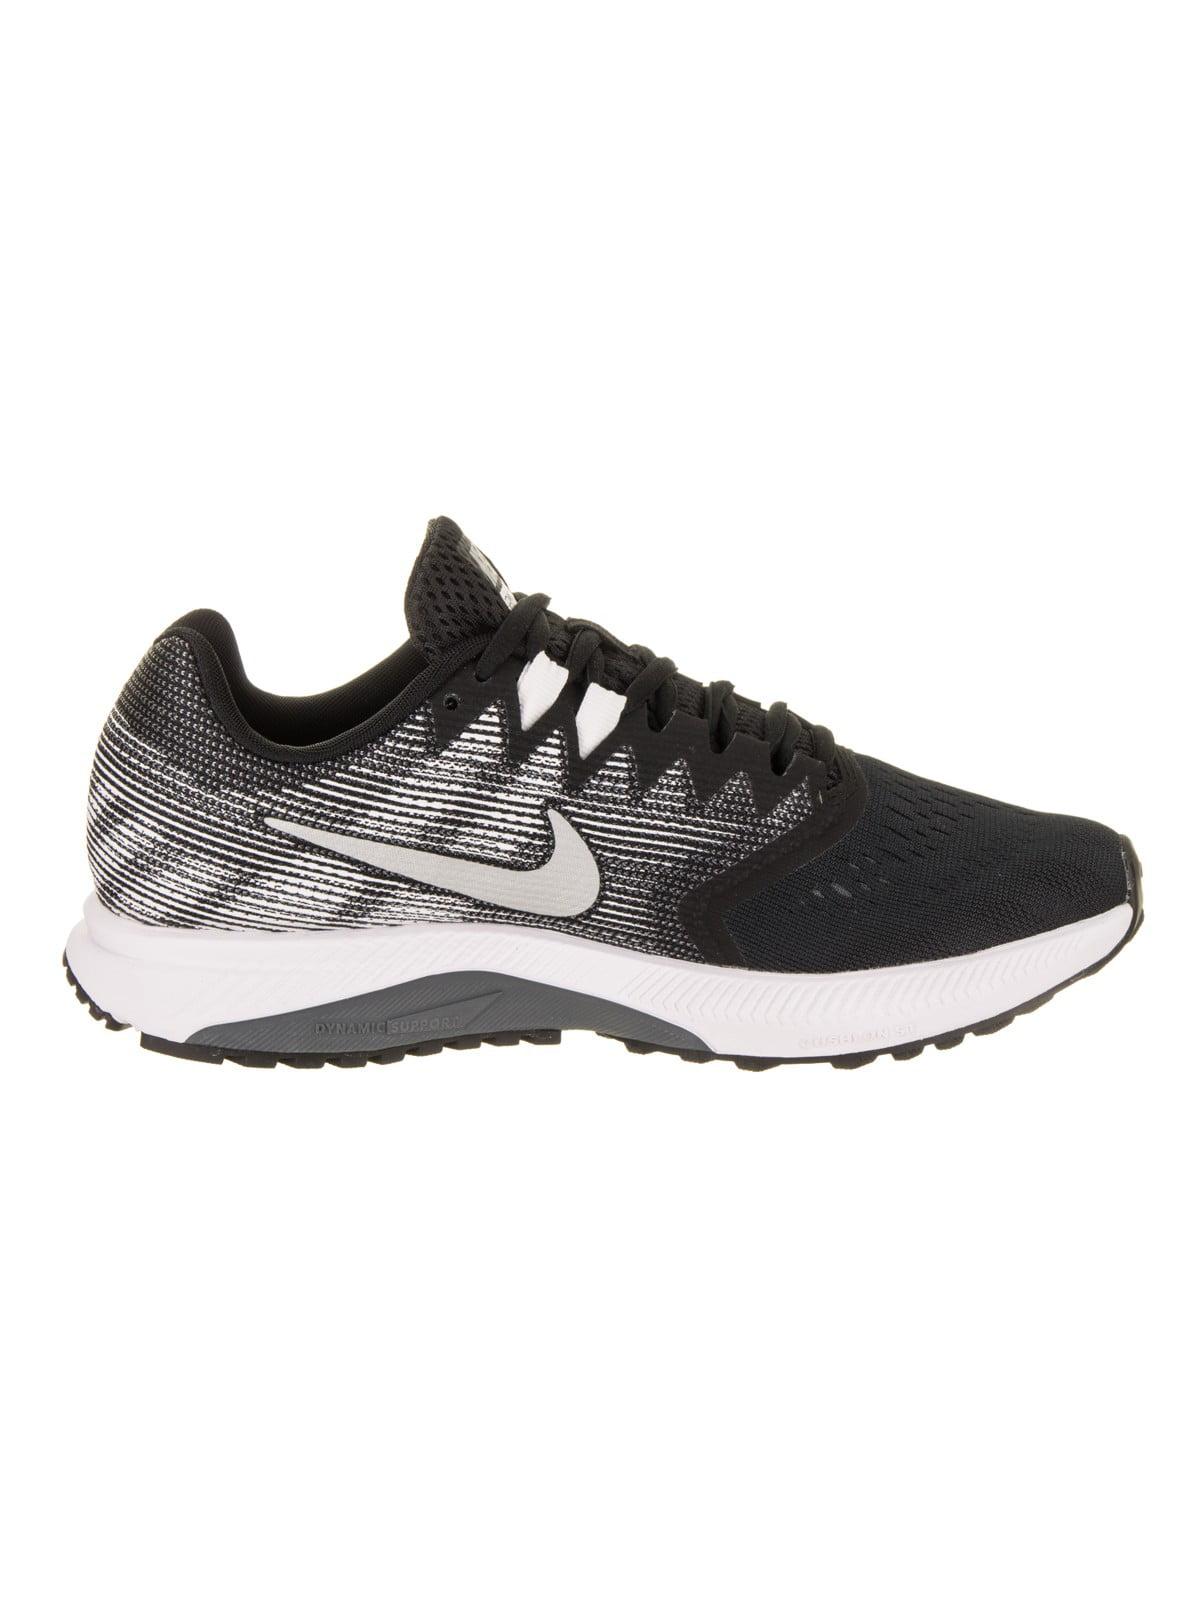 Women's Nike Air Zoom Span 2 Running Shoe